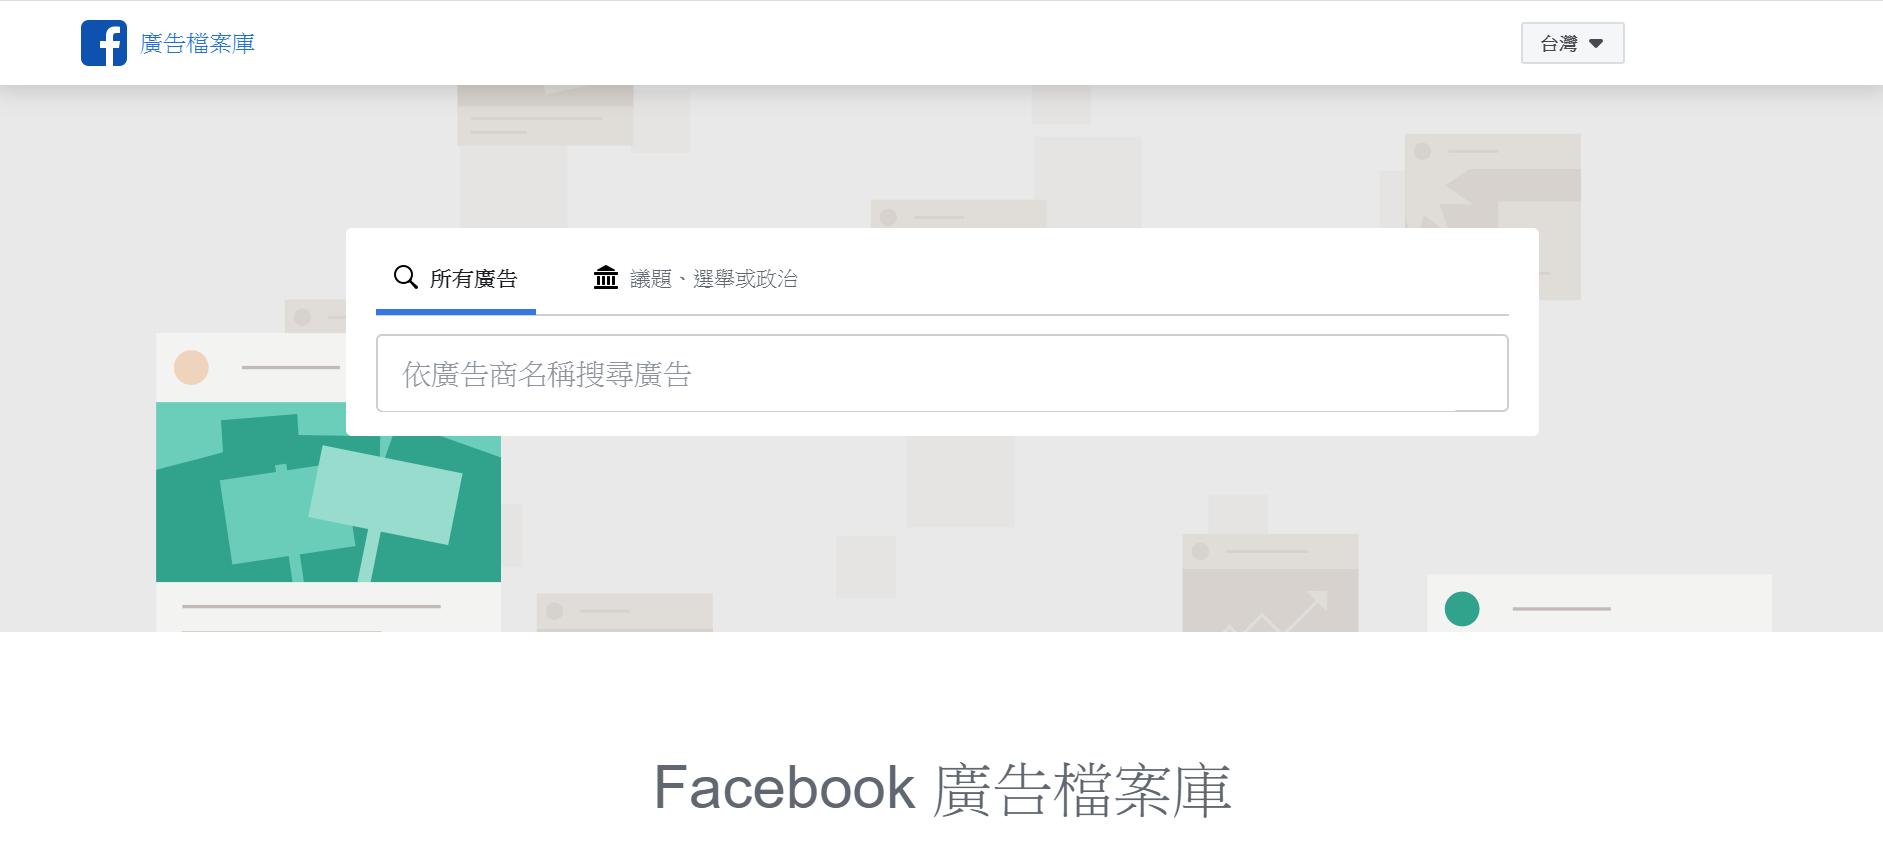 Facebook 廣告檔案庫